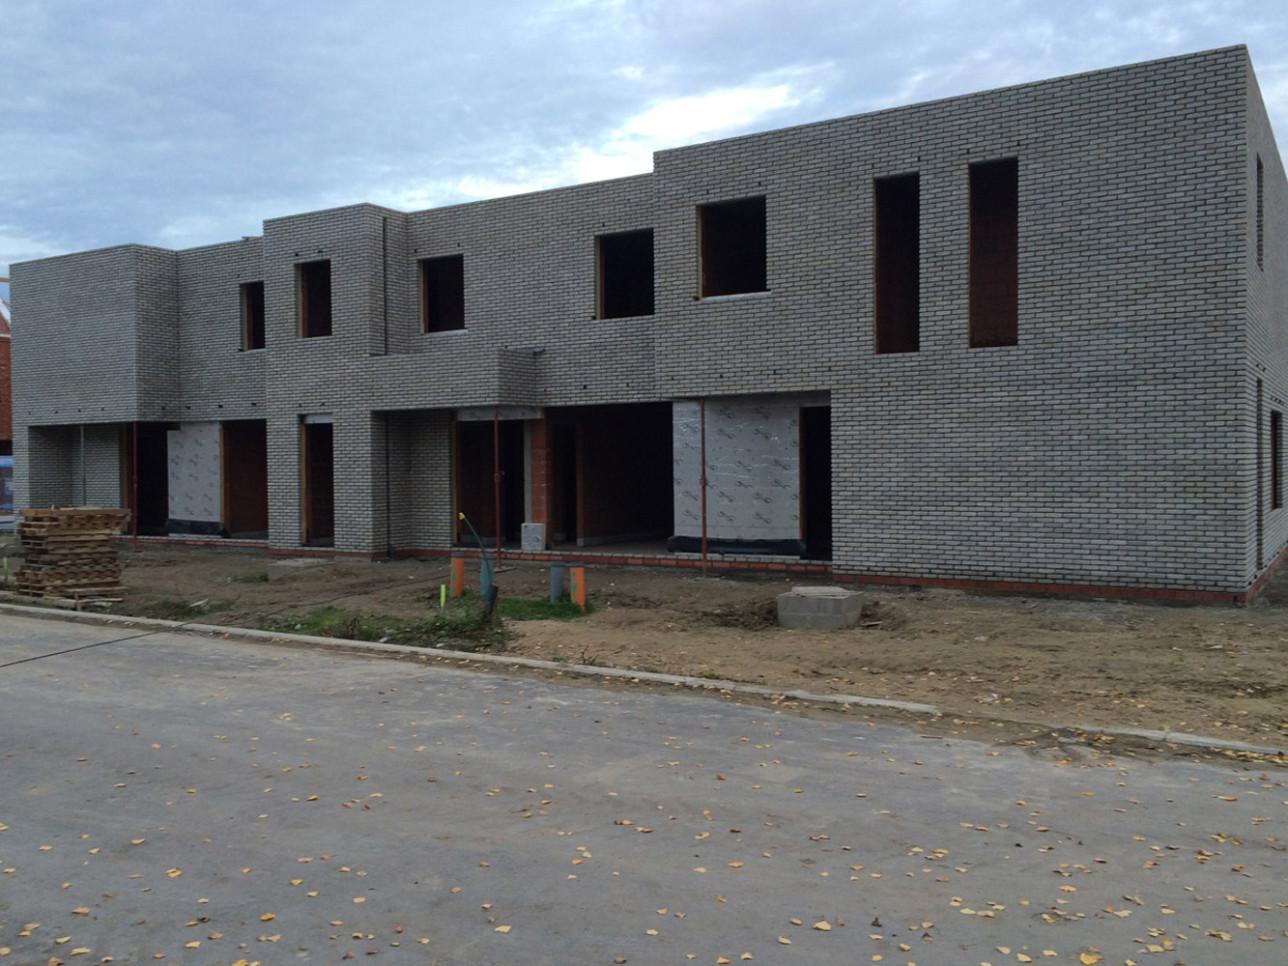 Strakke ééngezinswoning in Roeselare